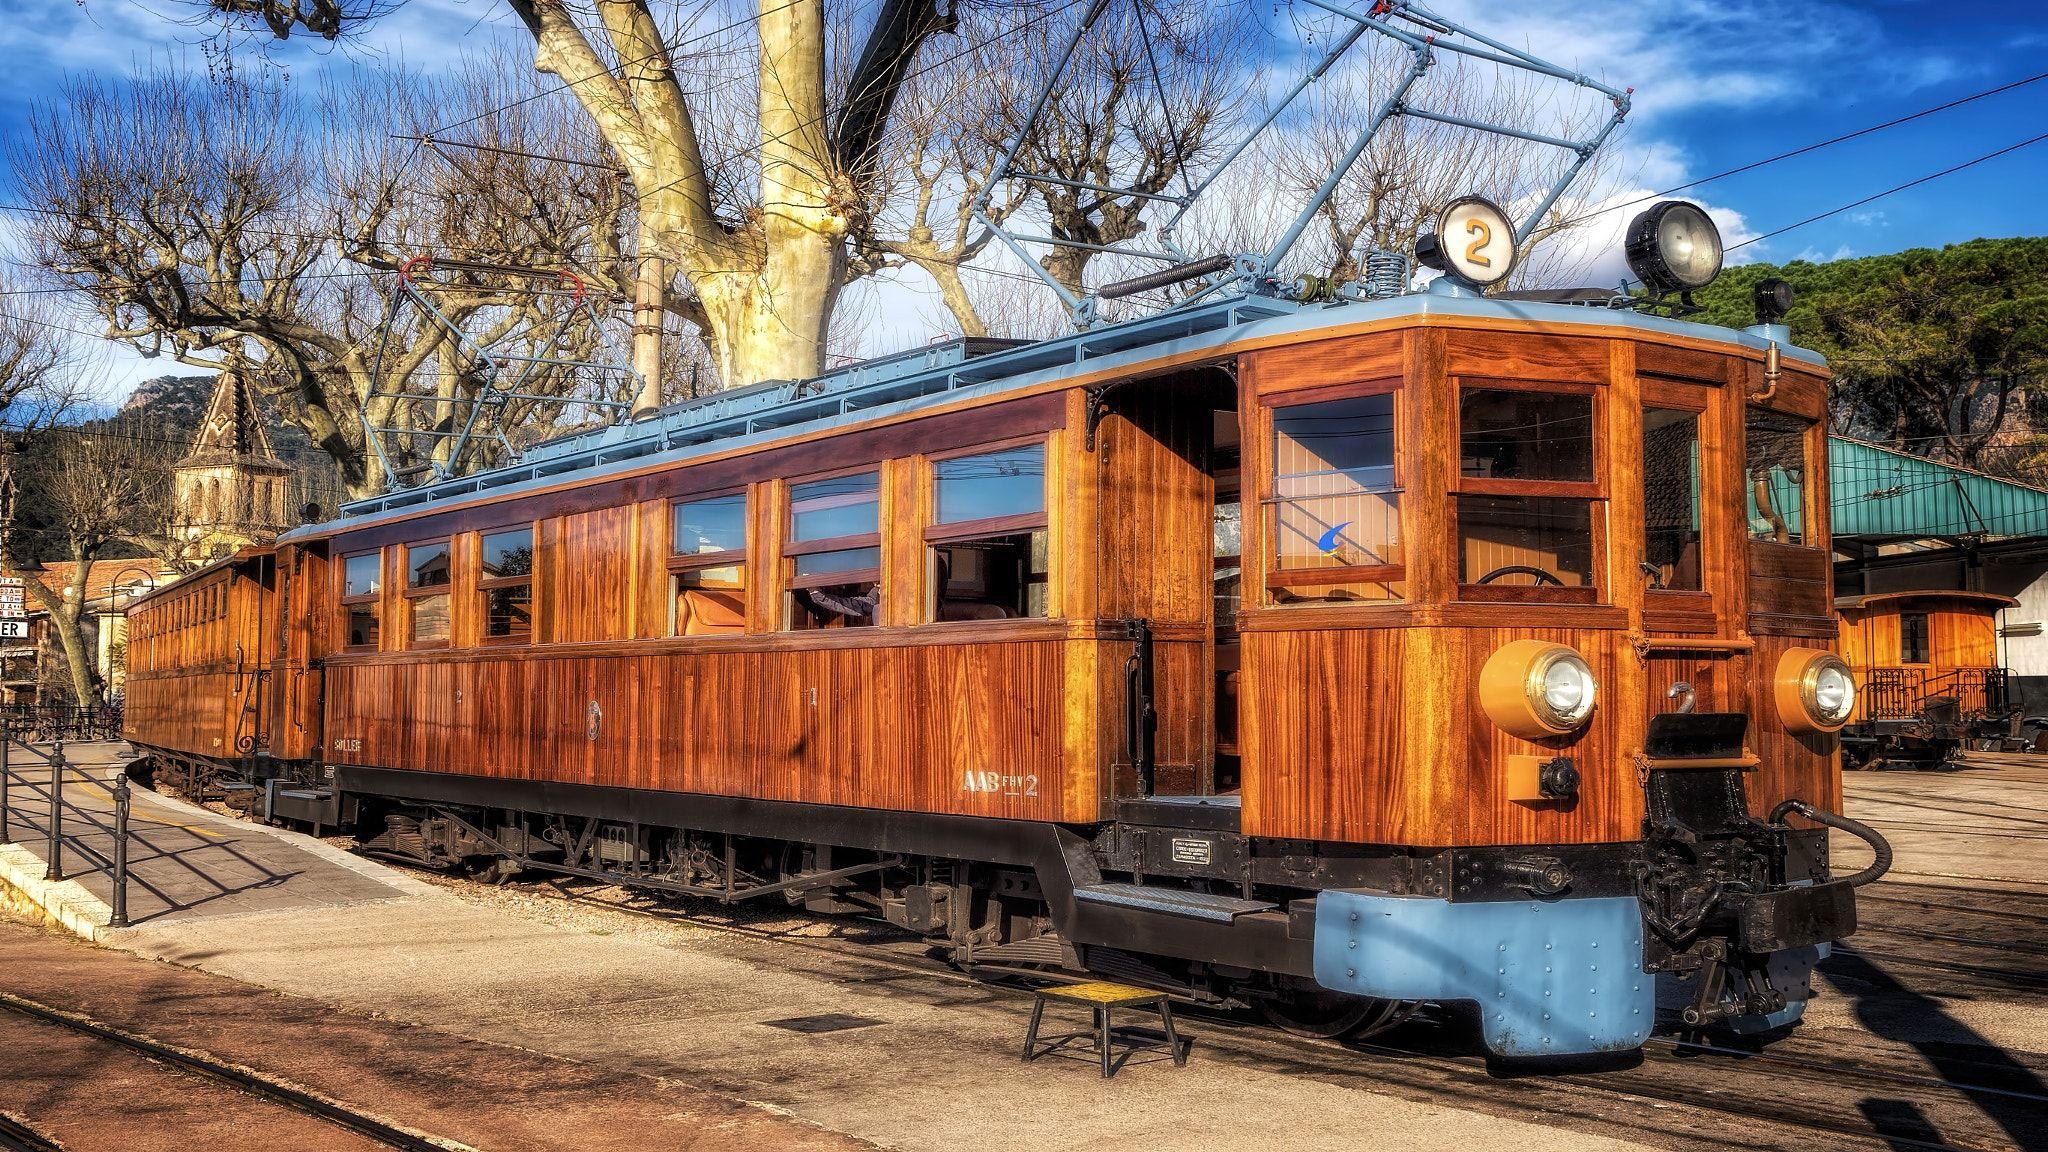 El Tren de Sóller - The Ferrocarril de Sóller (English: Railway of ...